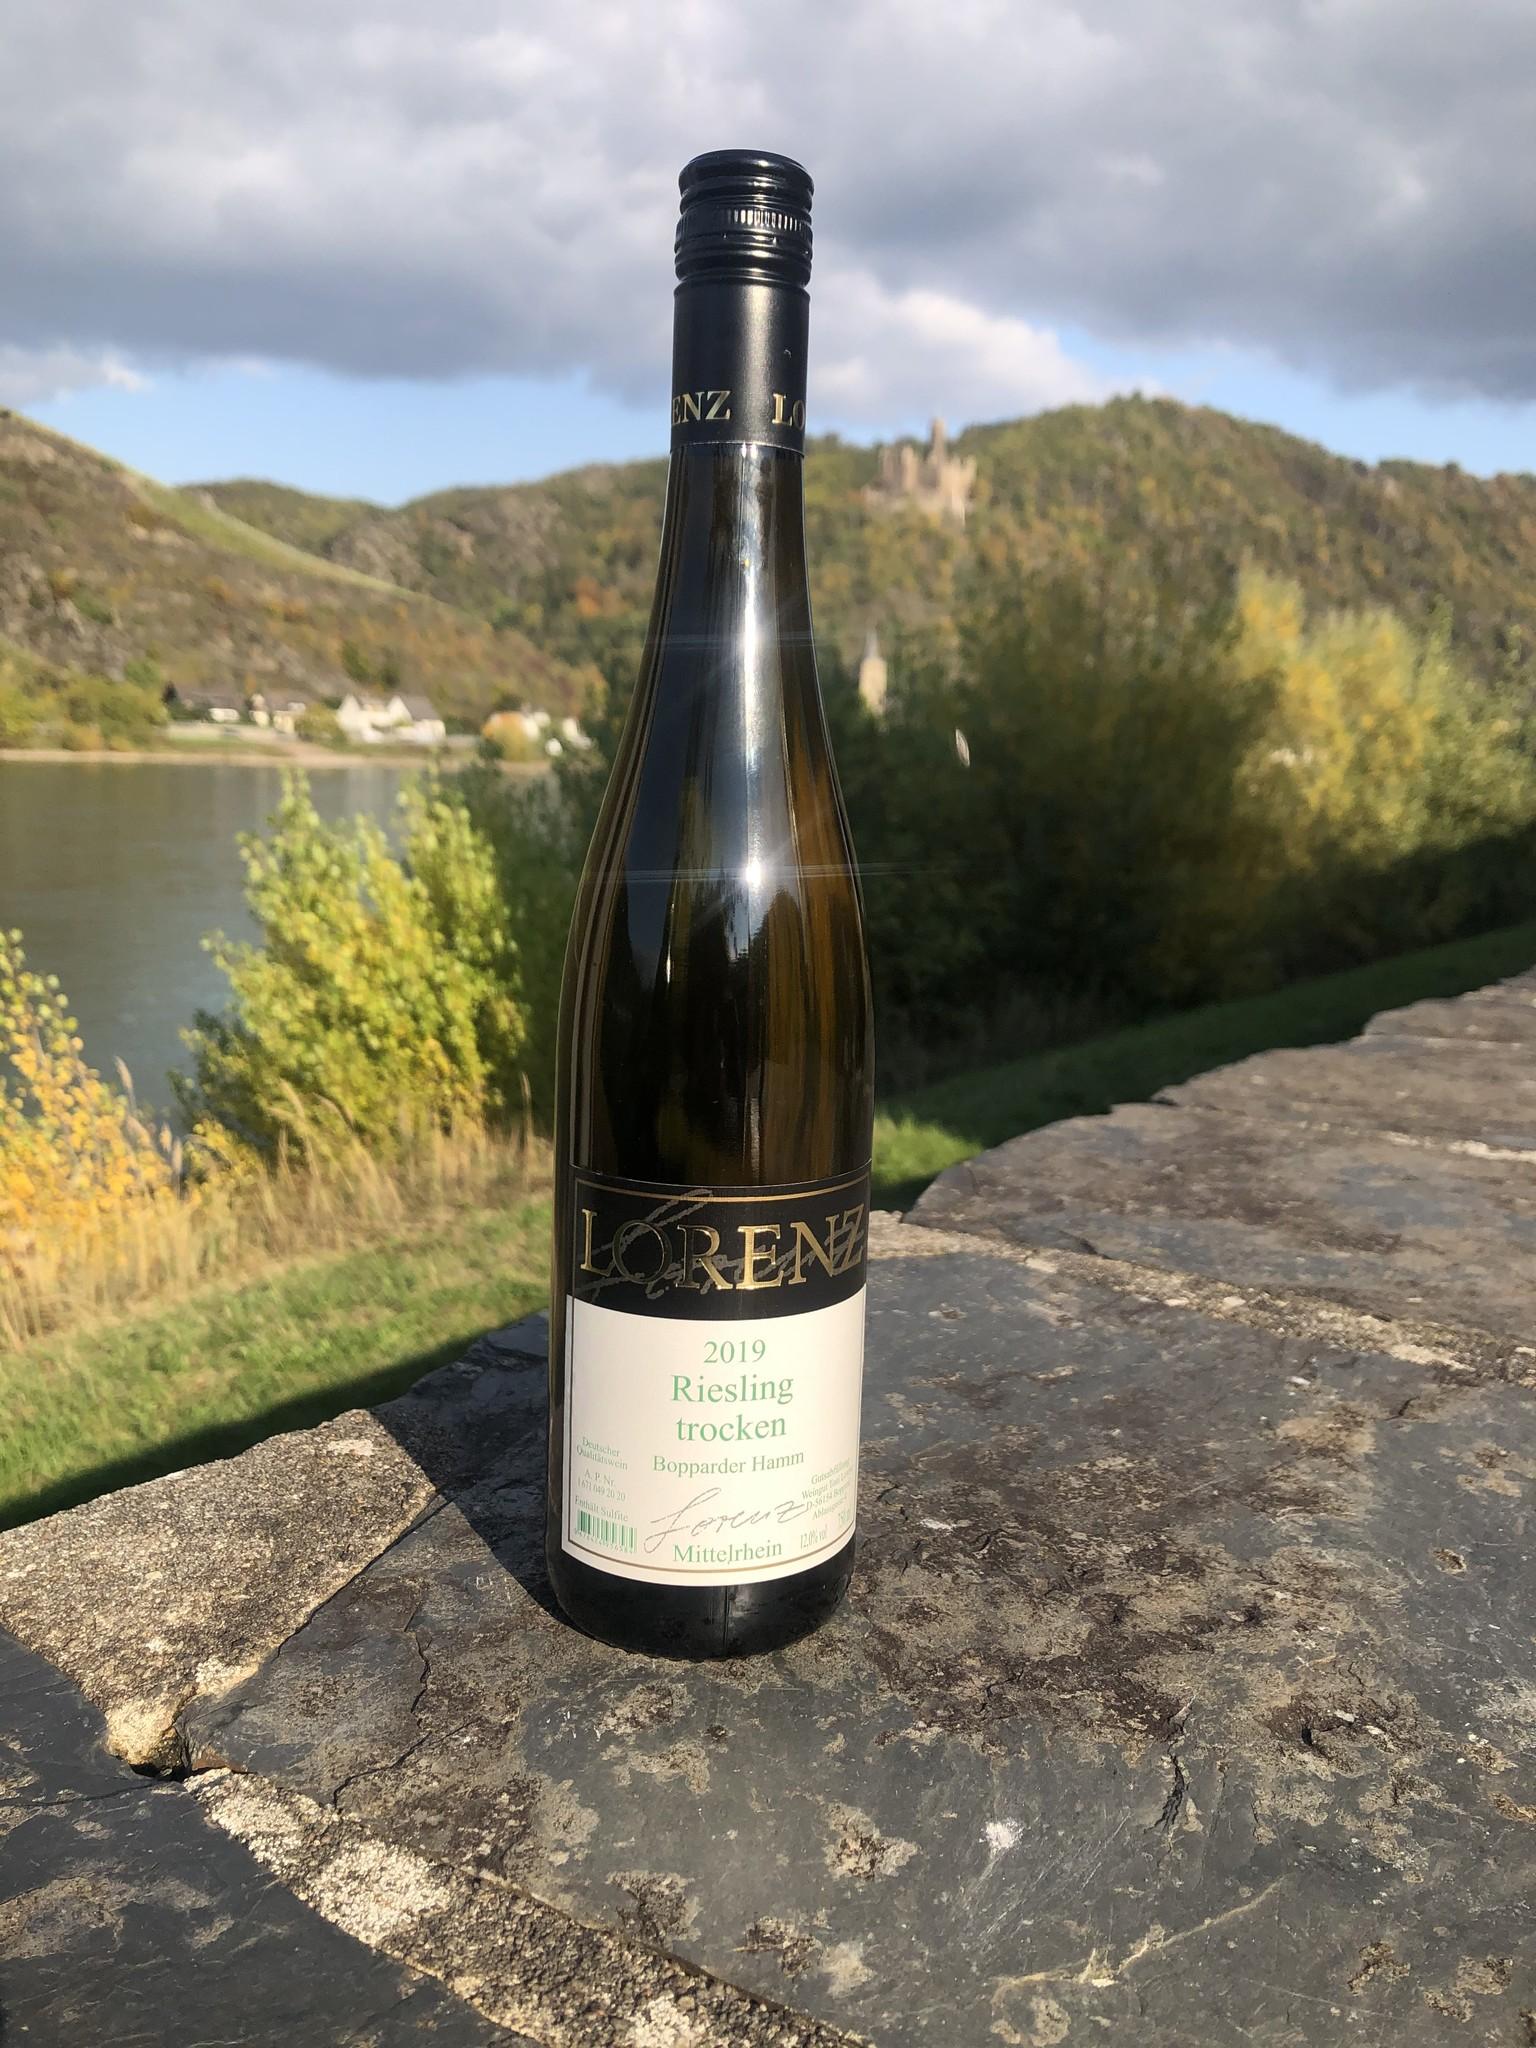 Weingut Toni Lorenz 2019 Lorenz Riesling Bopparder Hamm trocken Gutsabfüllung